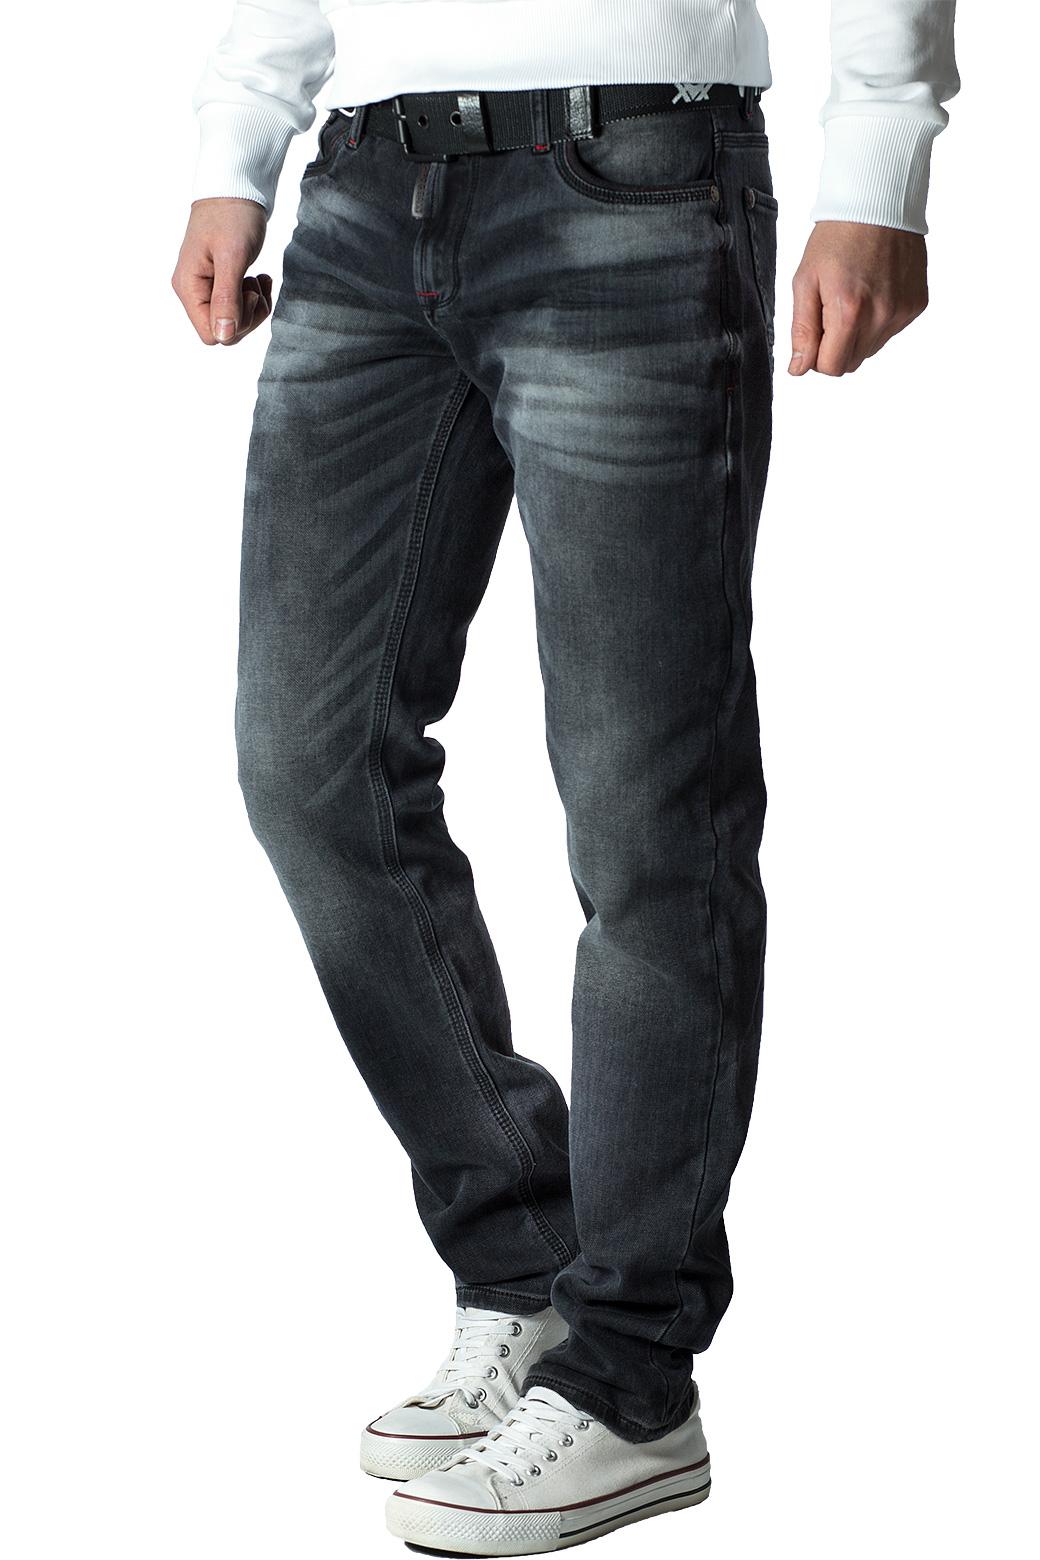 Cipo-amp-Baxx-Uomo-Jeans-Pantaloni-ricamate-Biker-Style-streetwear-nervature-pattern-Dope miniatura 27